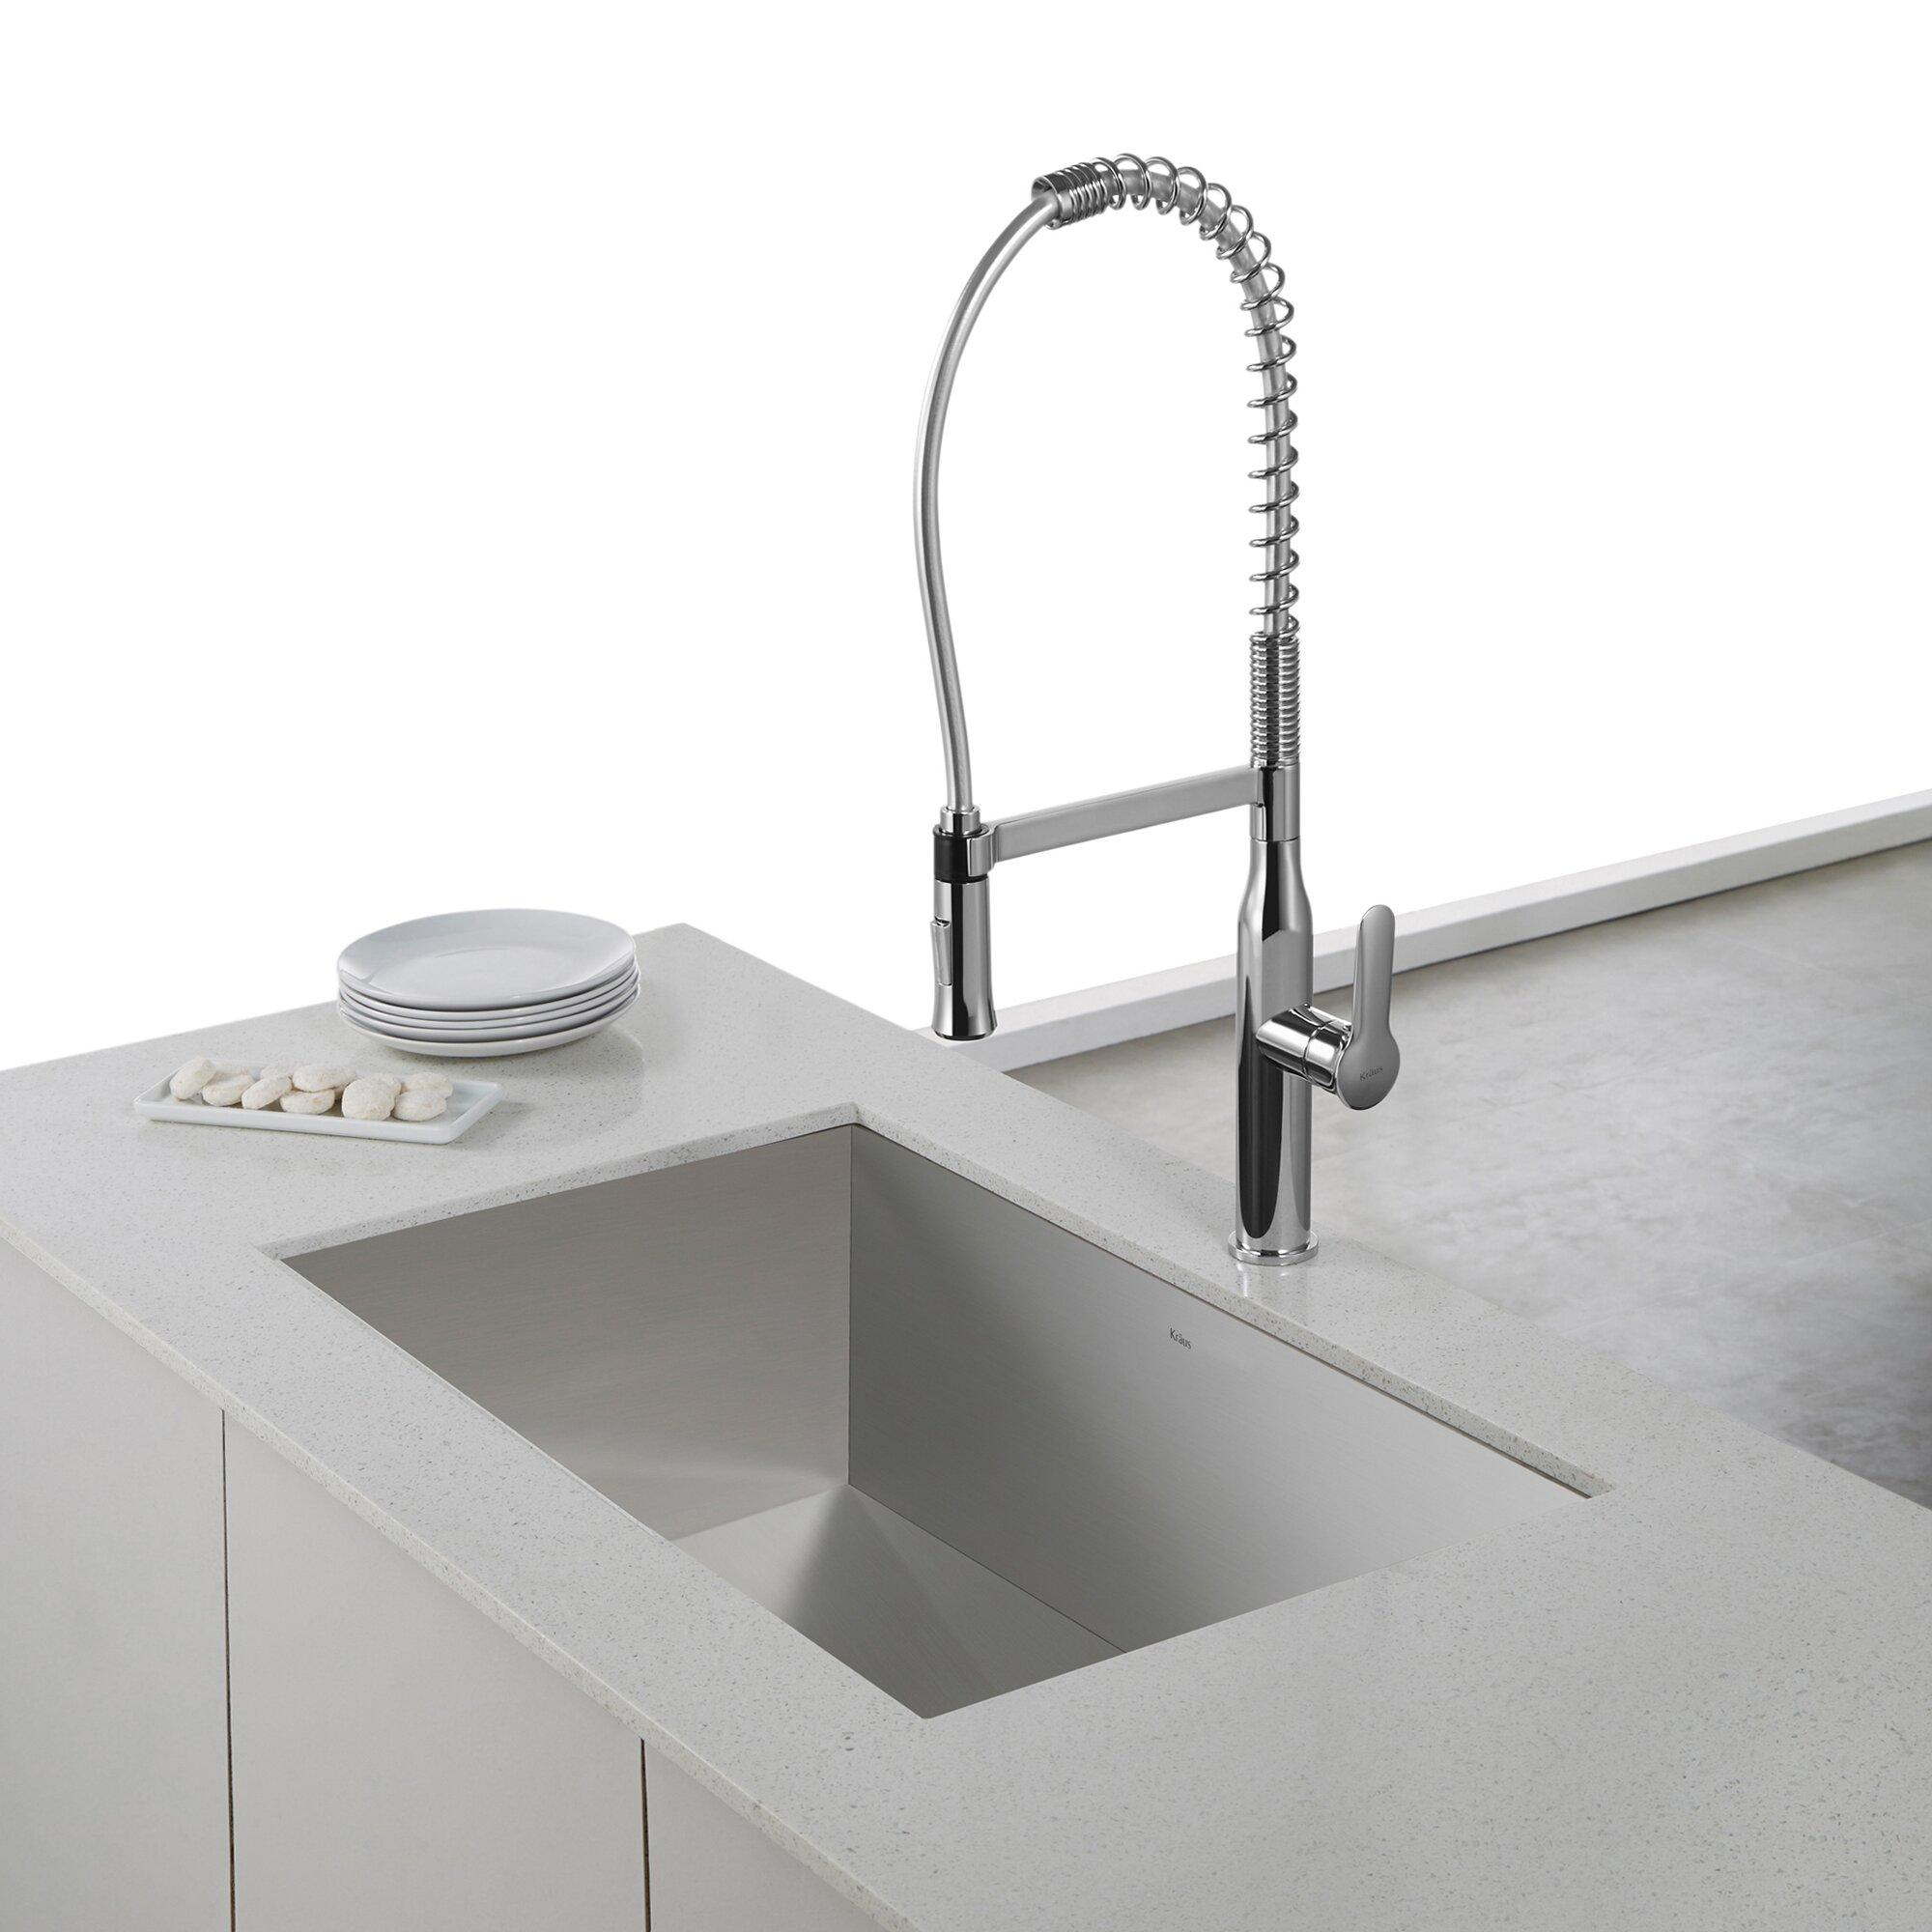 ... Handmade Undermount Single Bowl Stainless Steel Kitchen Sink Wayfair